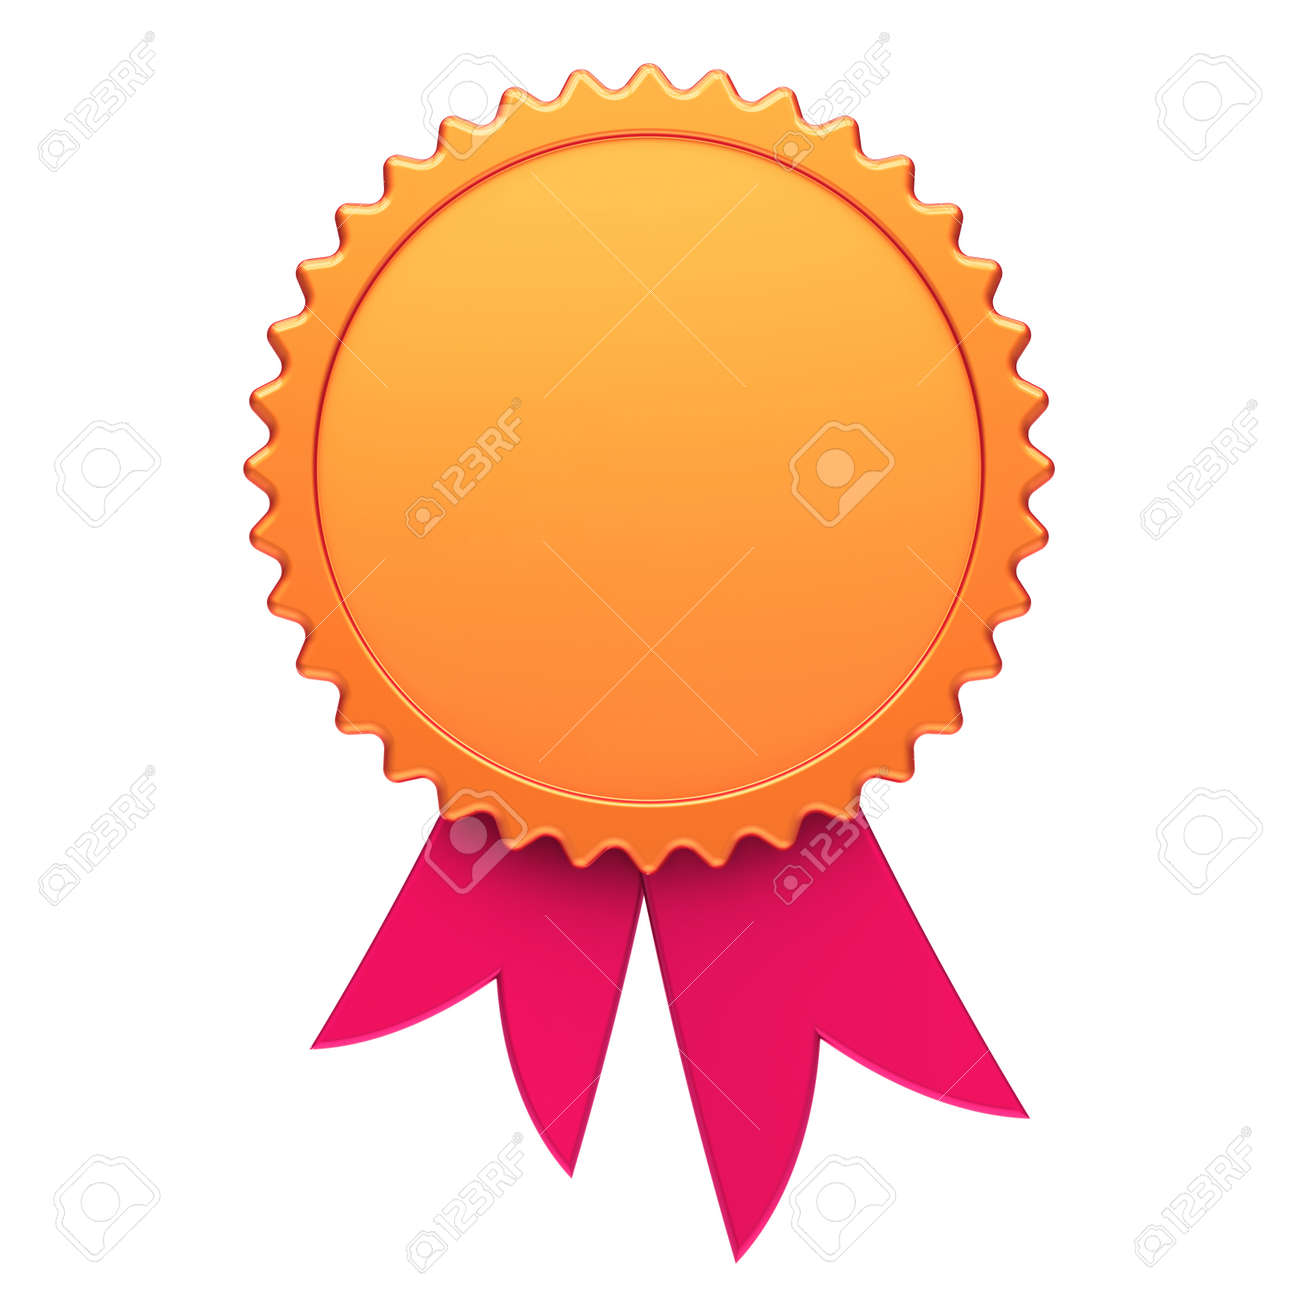 award ribbon golden red reward medal rosette blank achievement